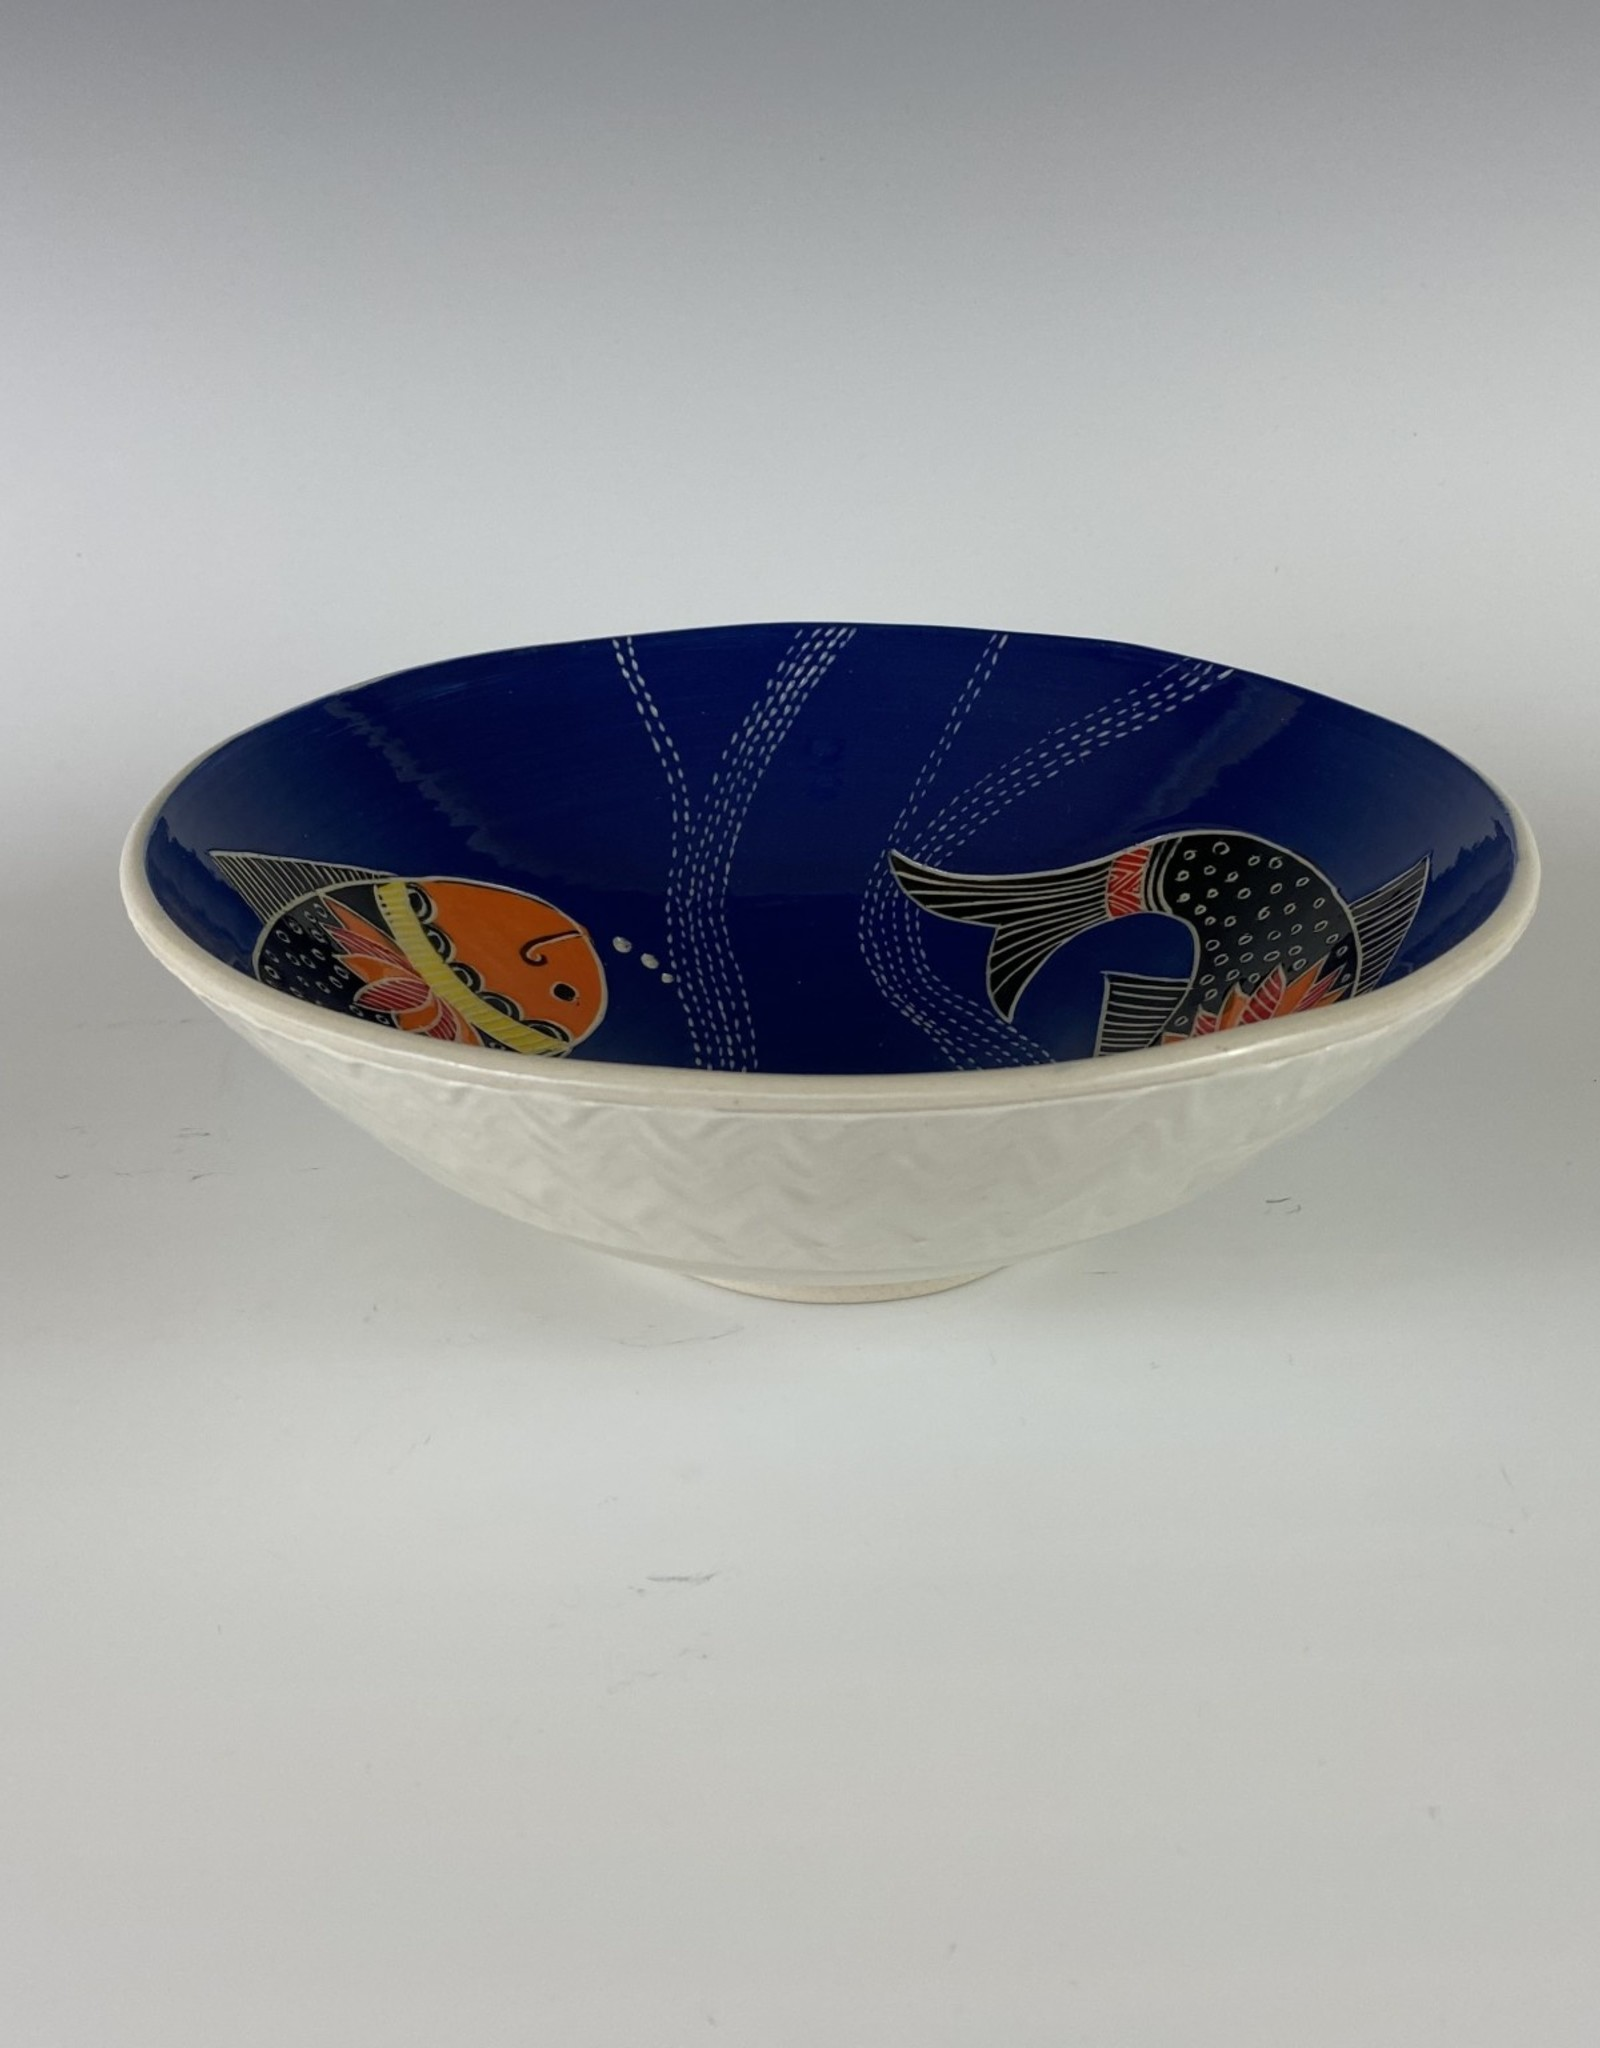 Anshula Tayal Amaati Madhubani 2 fish Bowl